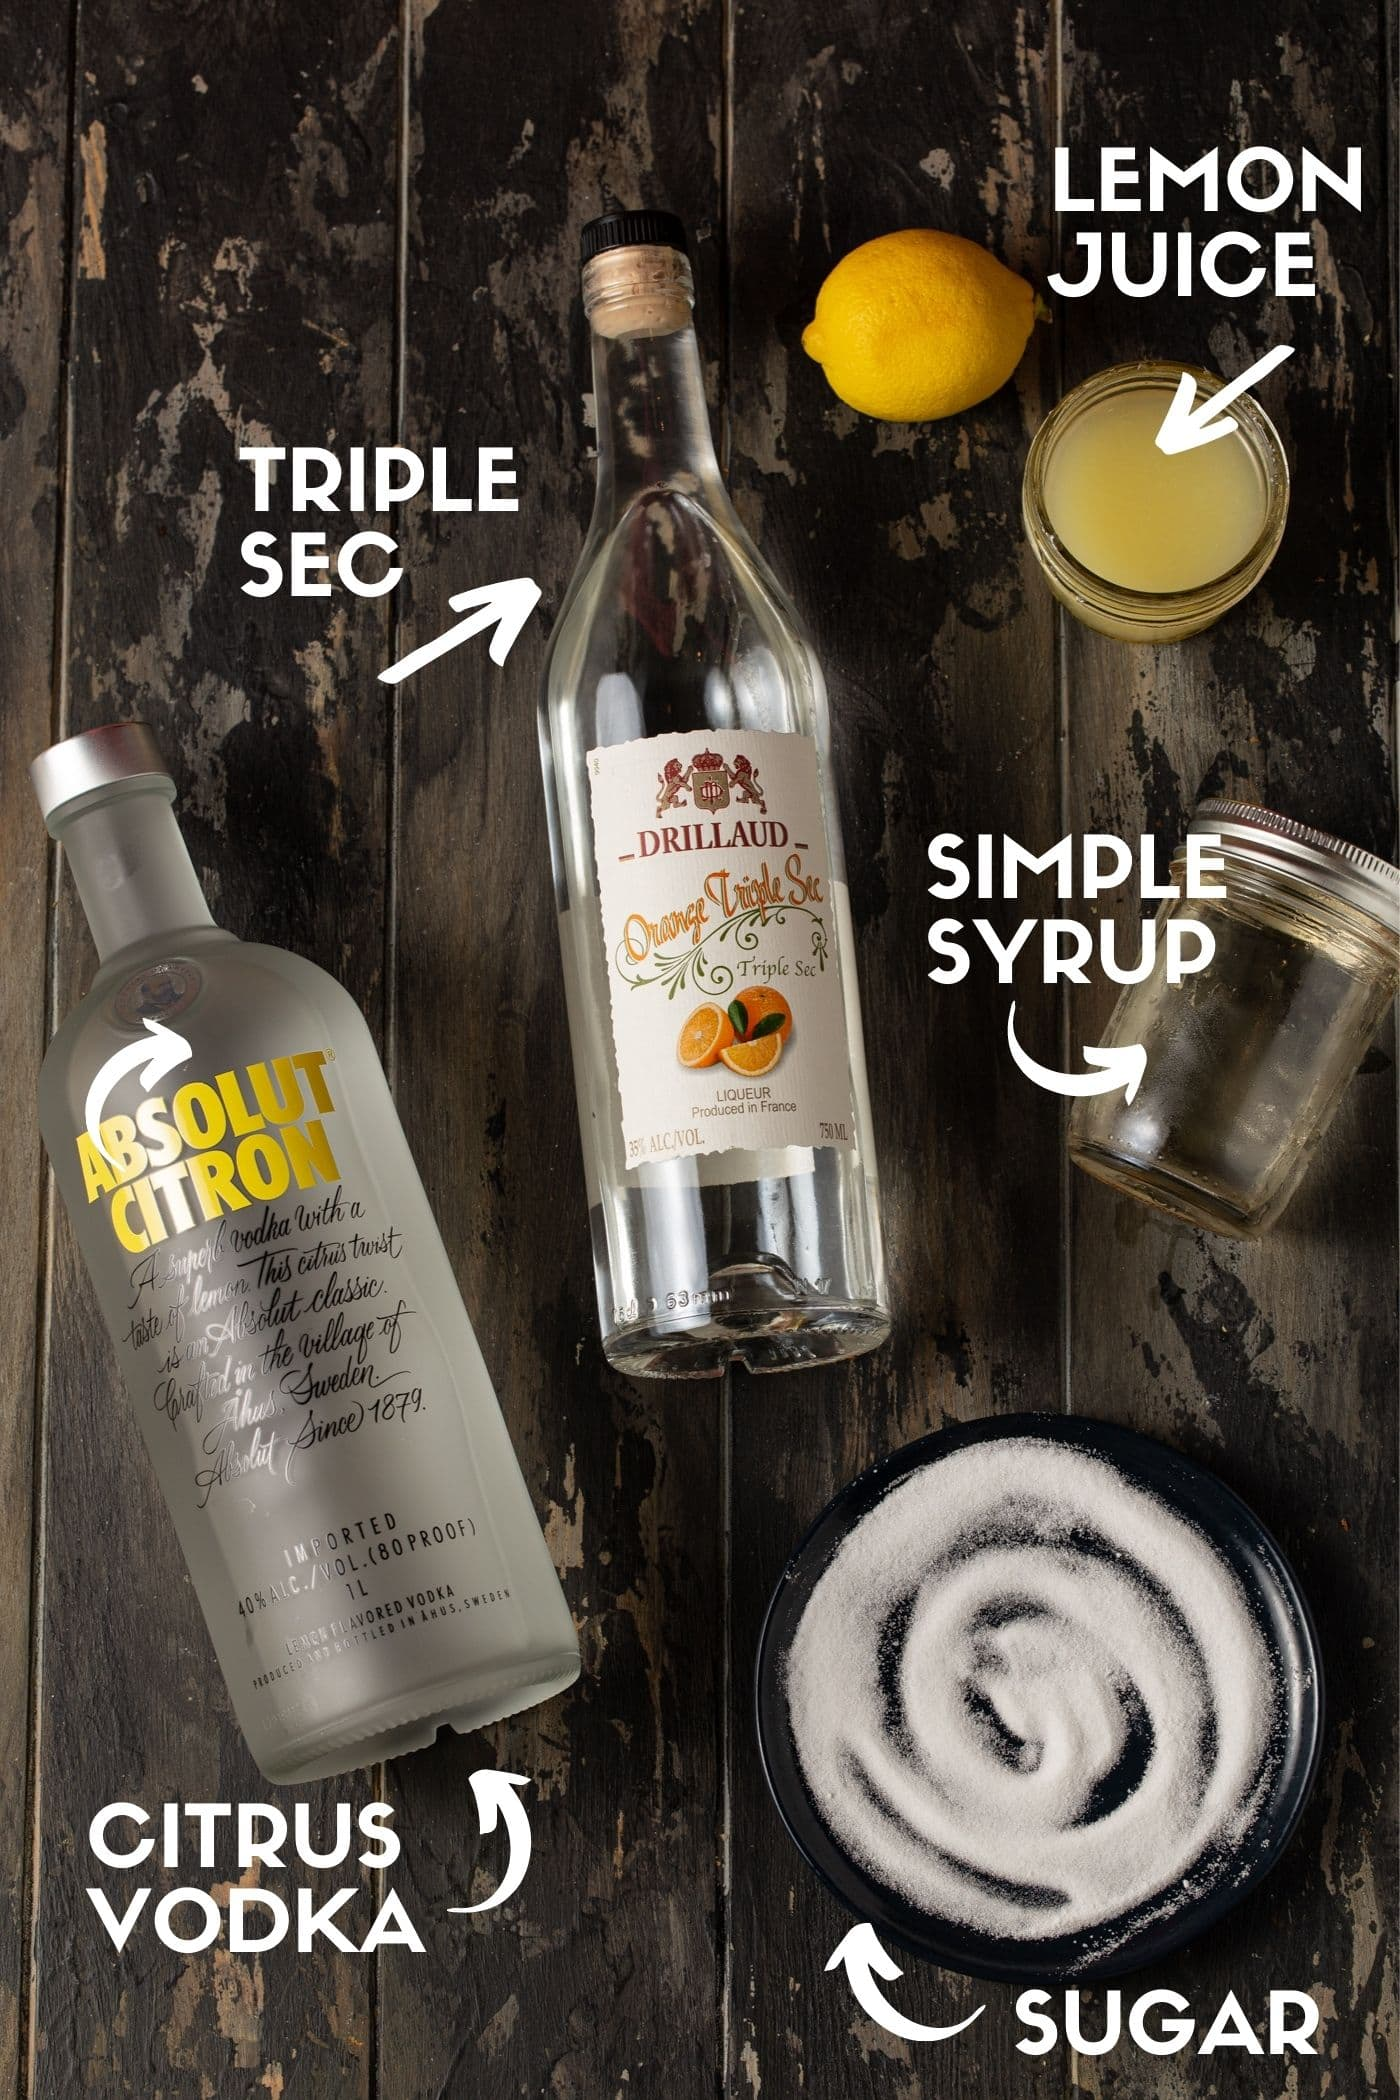 absolut citron vodka bottle, triple sec bottle, small jar filled with lemon juice, mason jar of simple syrup and superfine sugar.